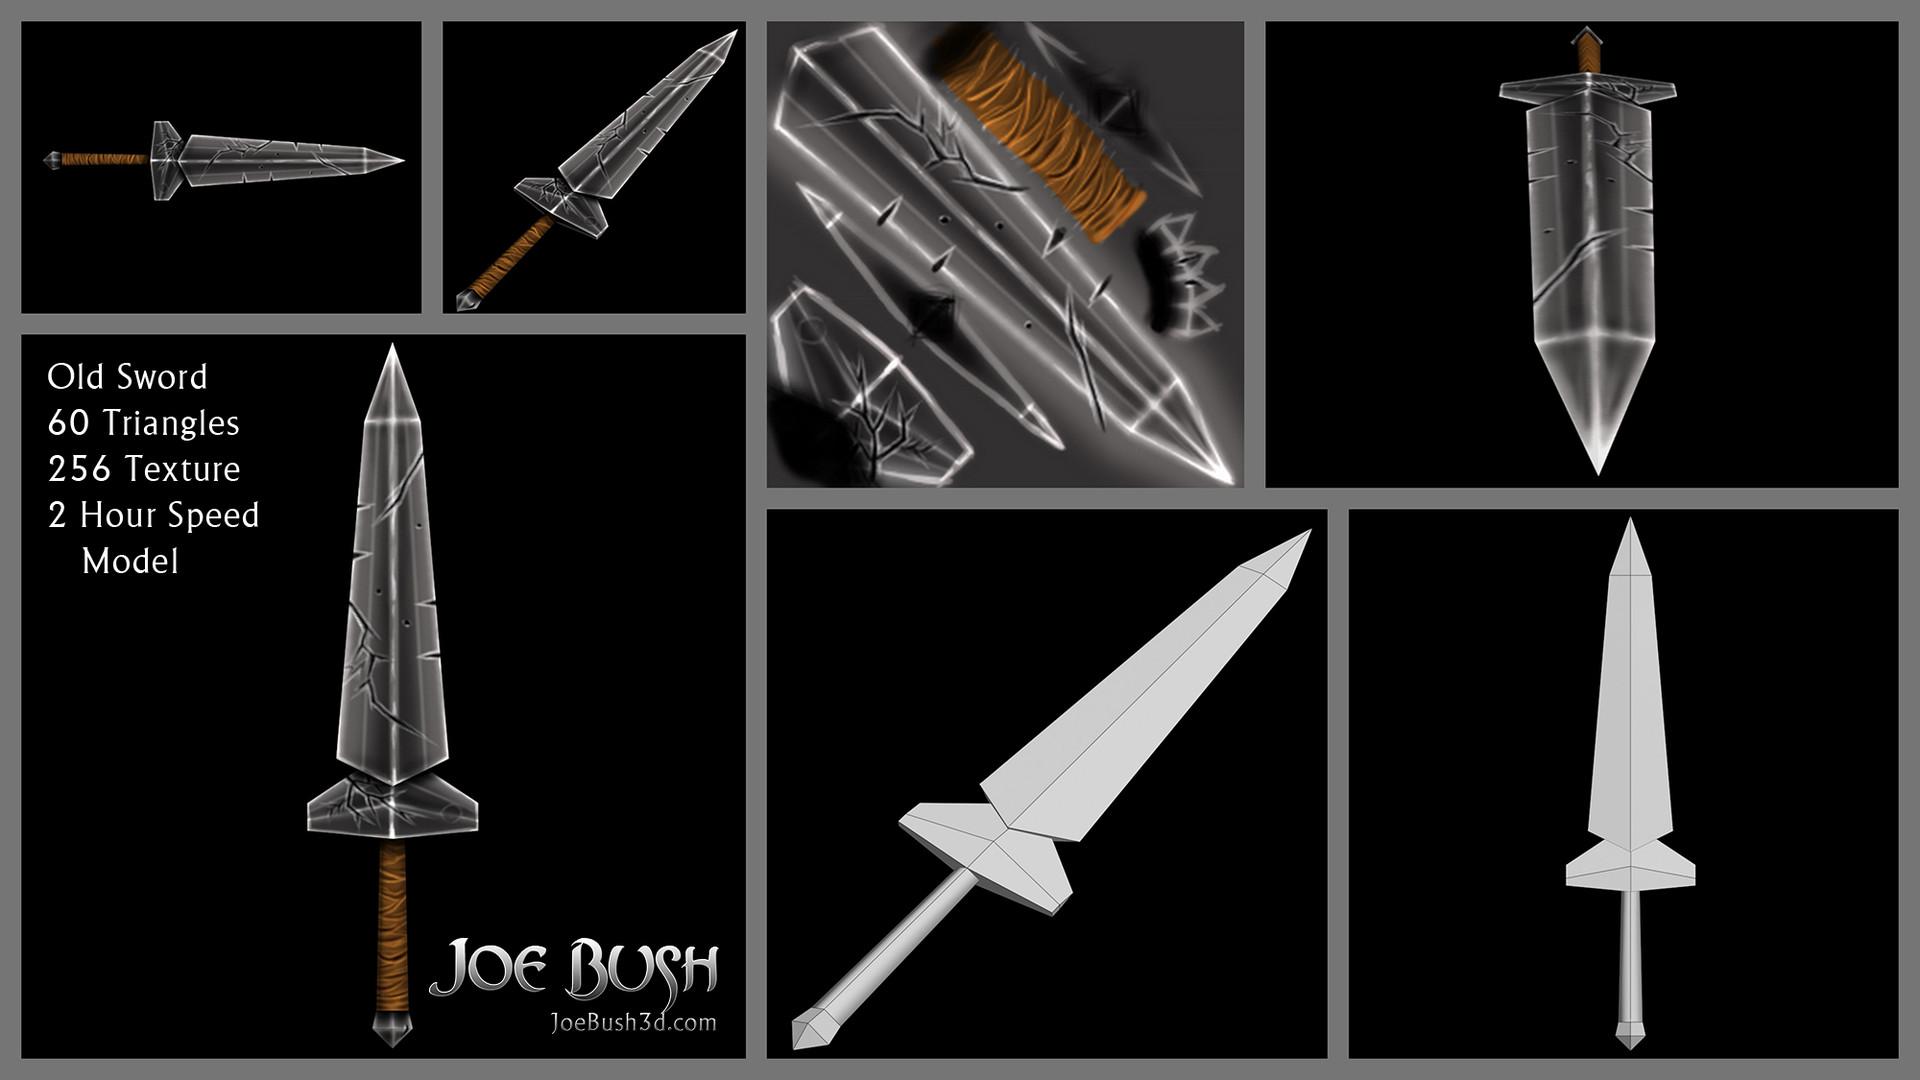 Joe bush dfsiii 2